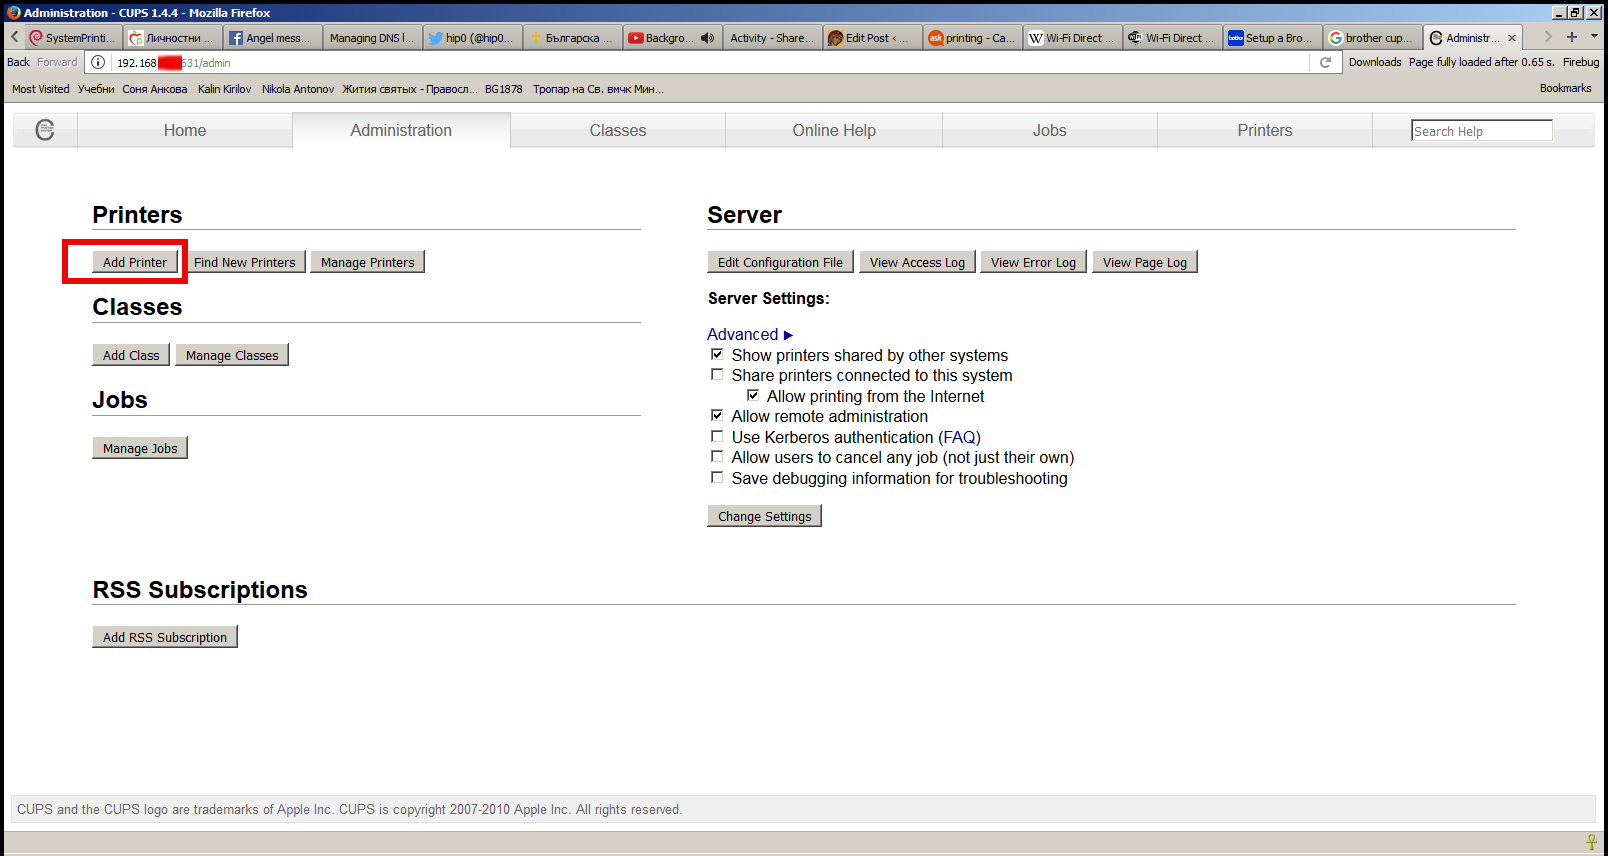 add-a-new-printer-cups-web-admin-interface-screenshot-in-a-firefox-browser